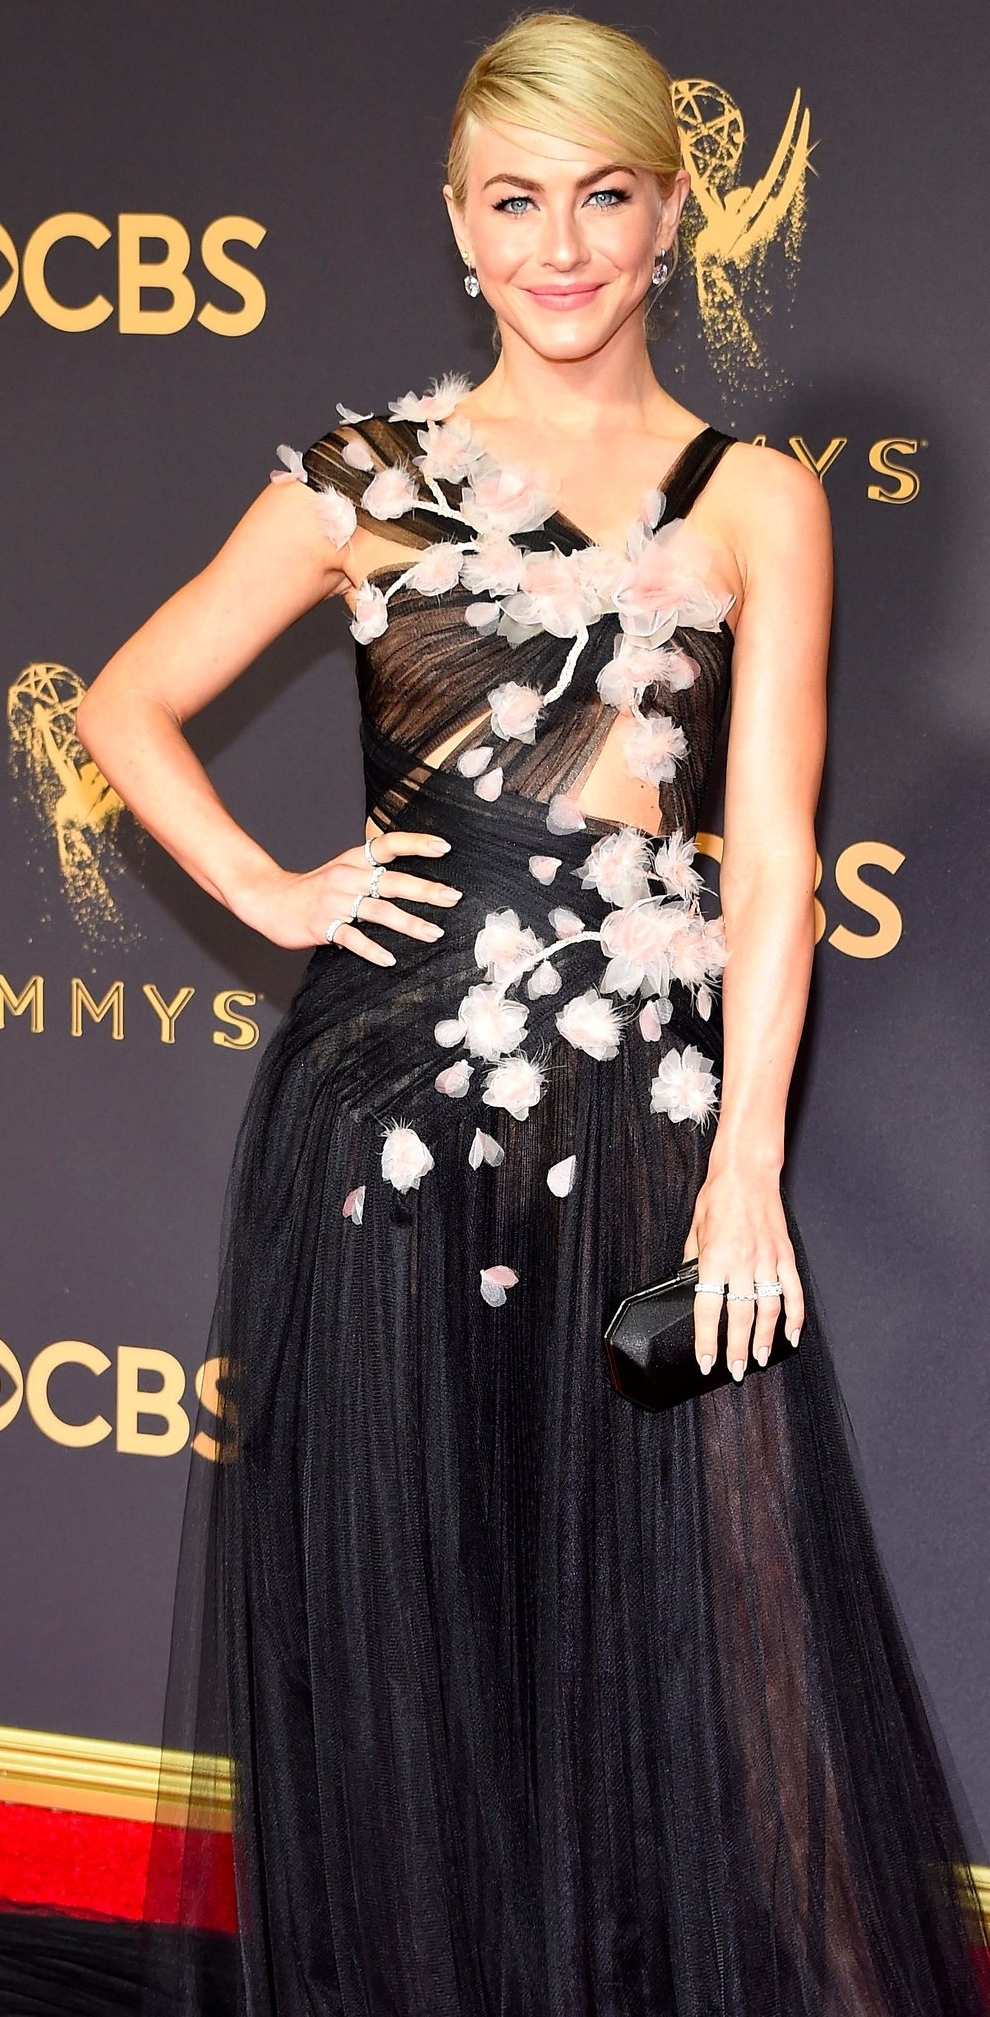 Julianne-Hough-Emmys-Dress-2017.jpg